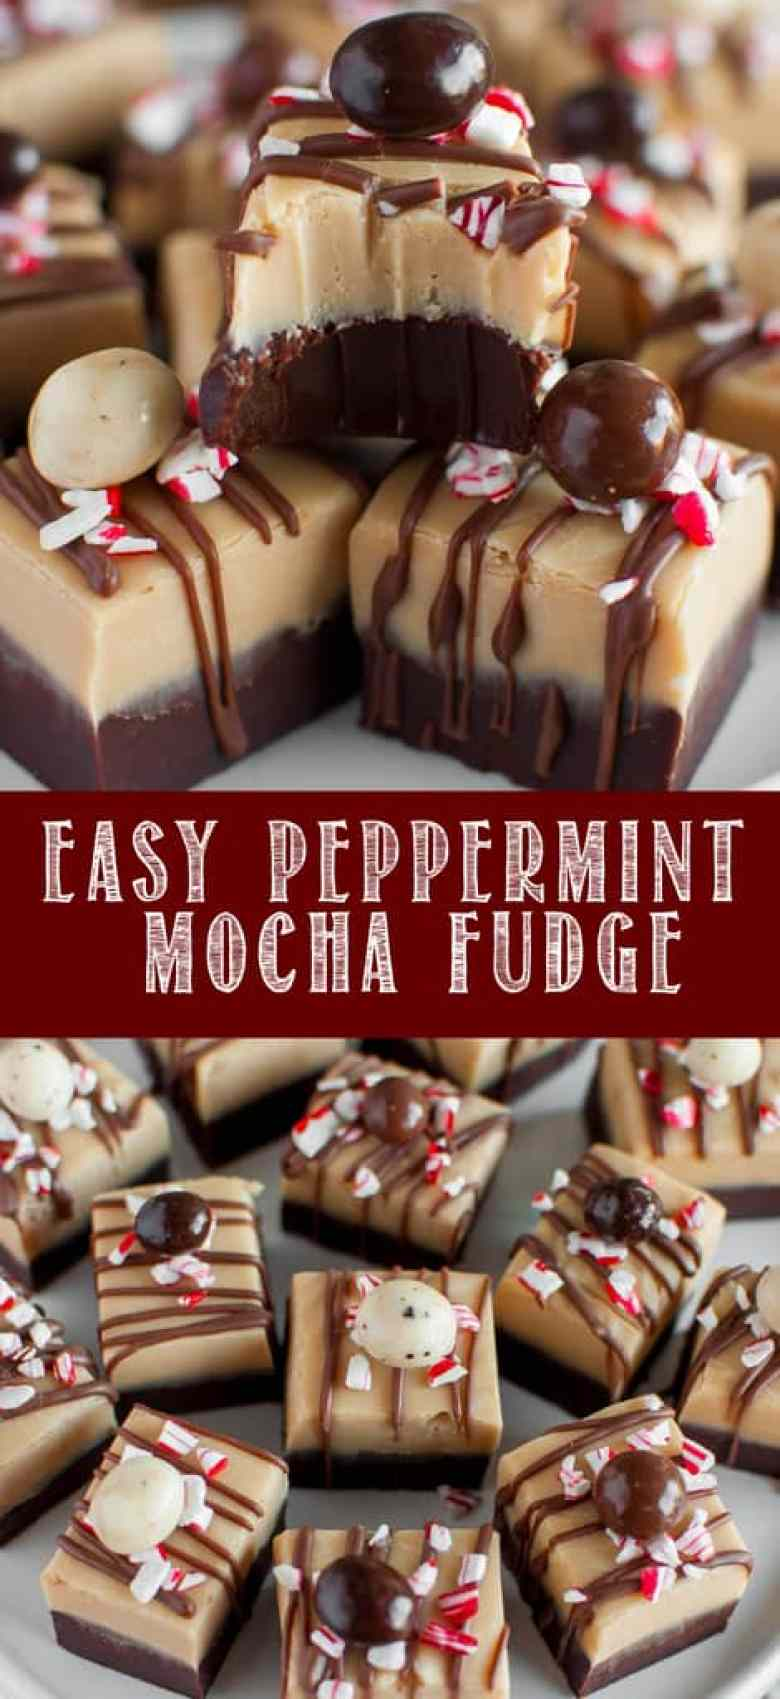 Peppermint Mocha Fudge collage photo